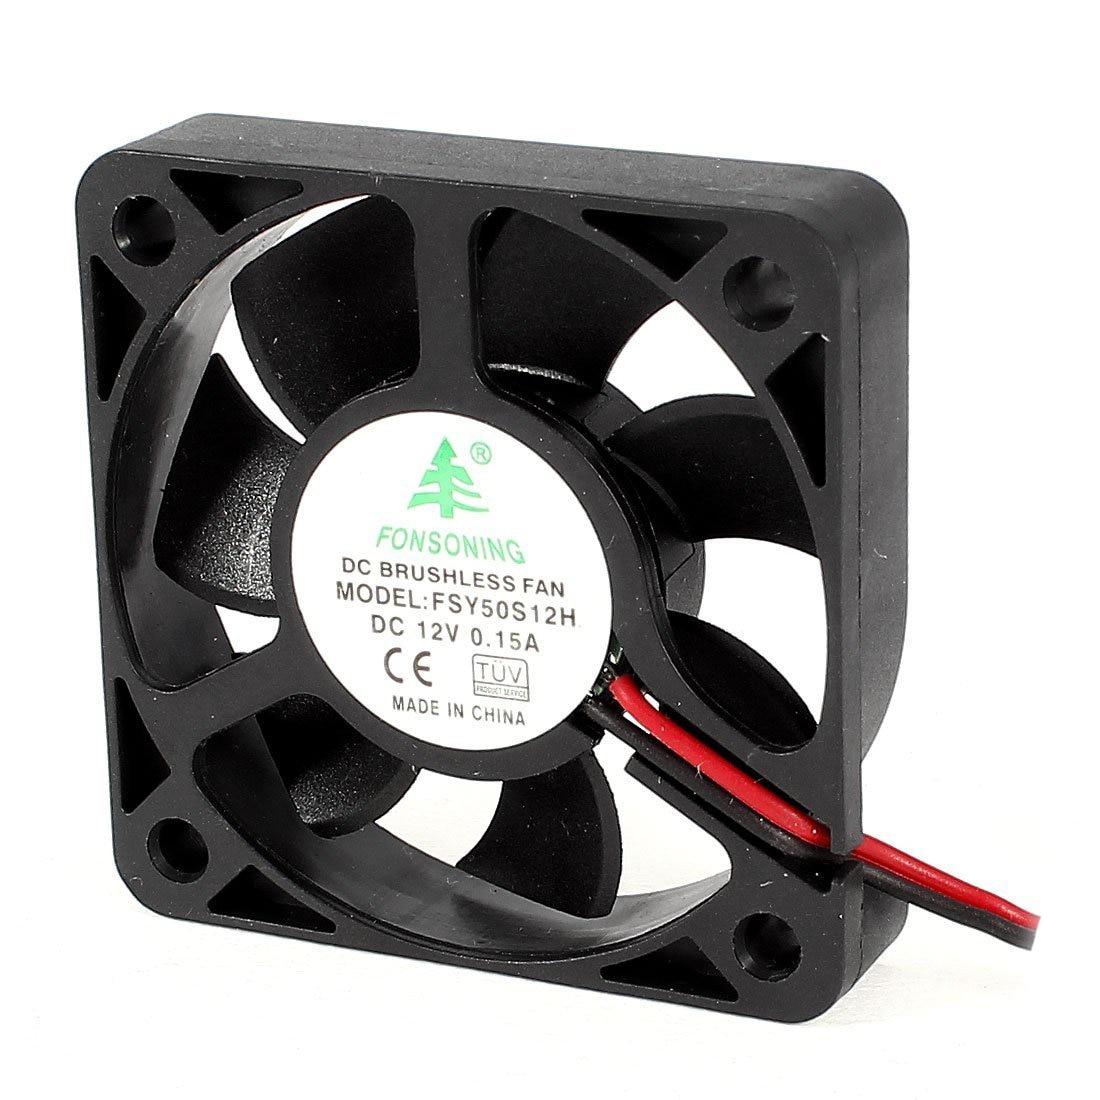 FONSONING FSY50S12H 50mm x 10mm 2Pin 12V DC Brushless PC Case Cooling Fan 5 pieces lot dc 12v 2pin 140 x 140 x 25mm 14025s pc computer case heatsink cooling fan